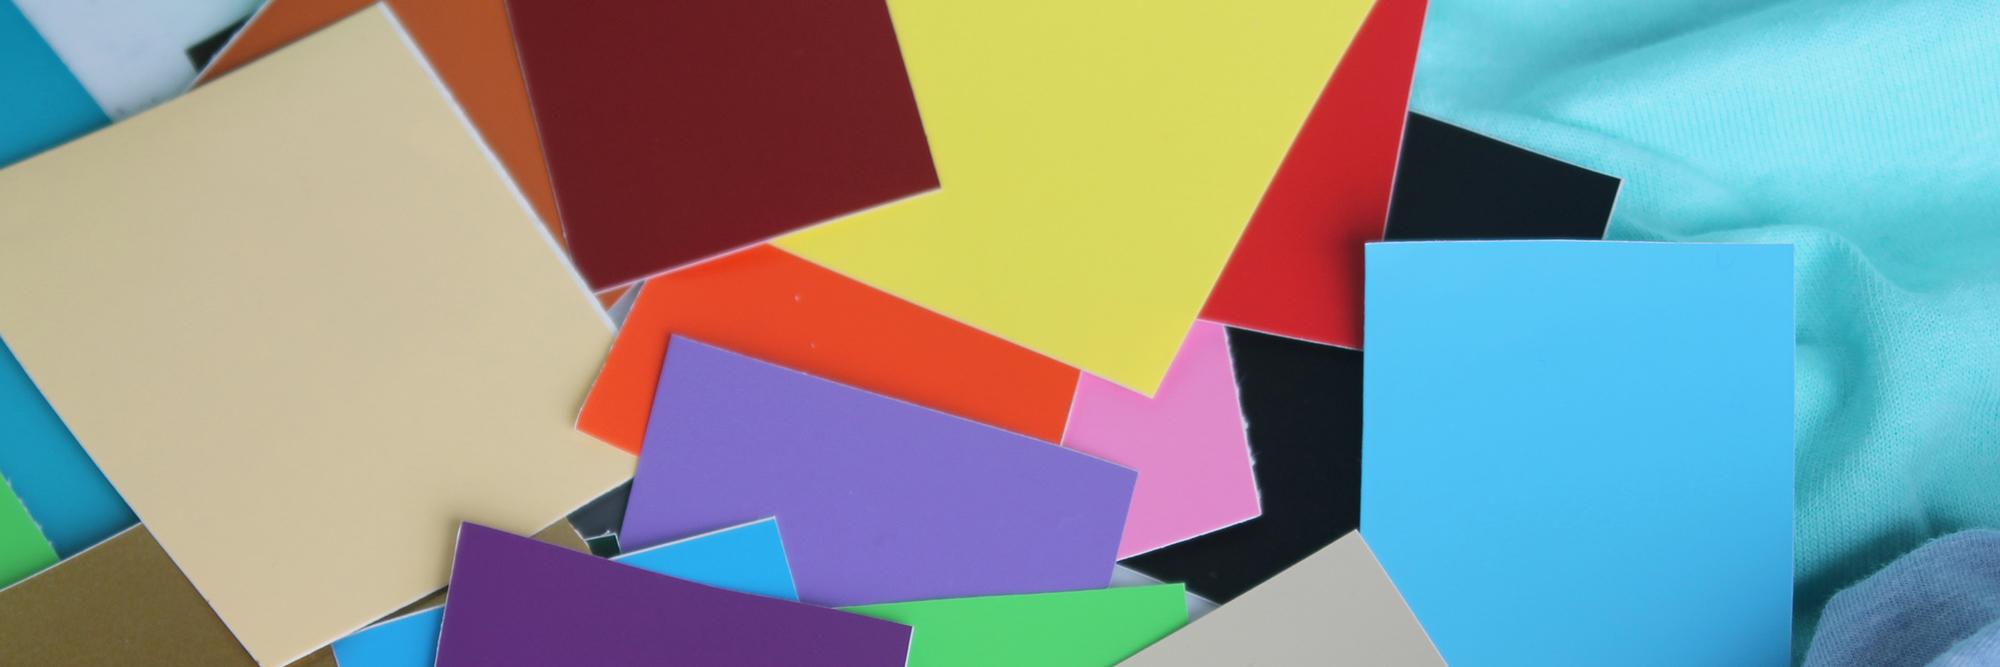 faqs-decalcolors.jpg